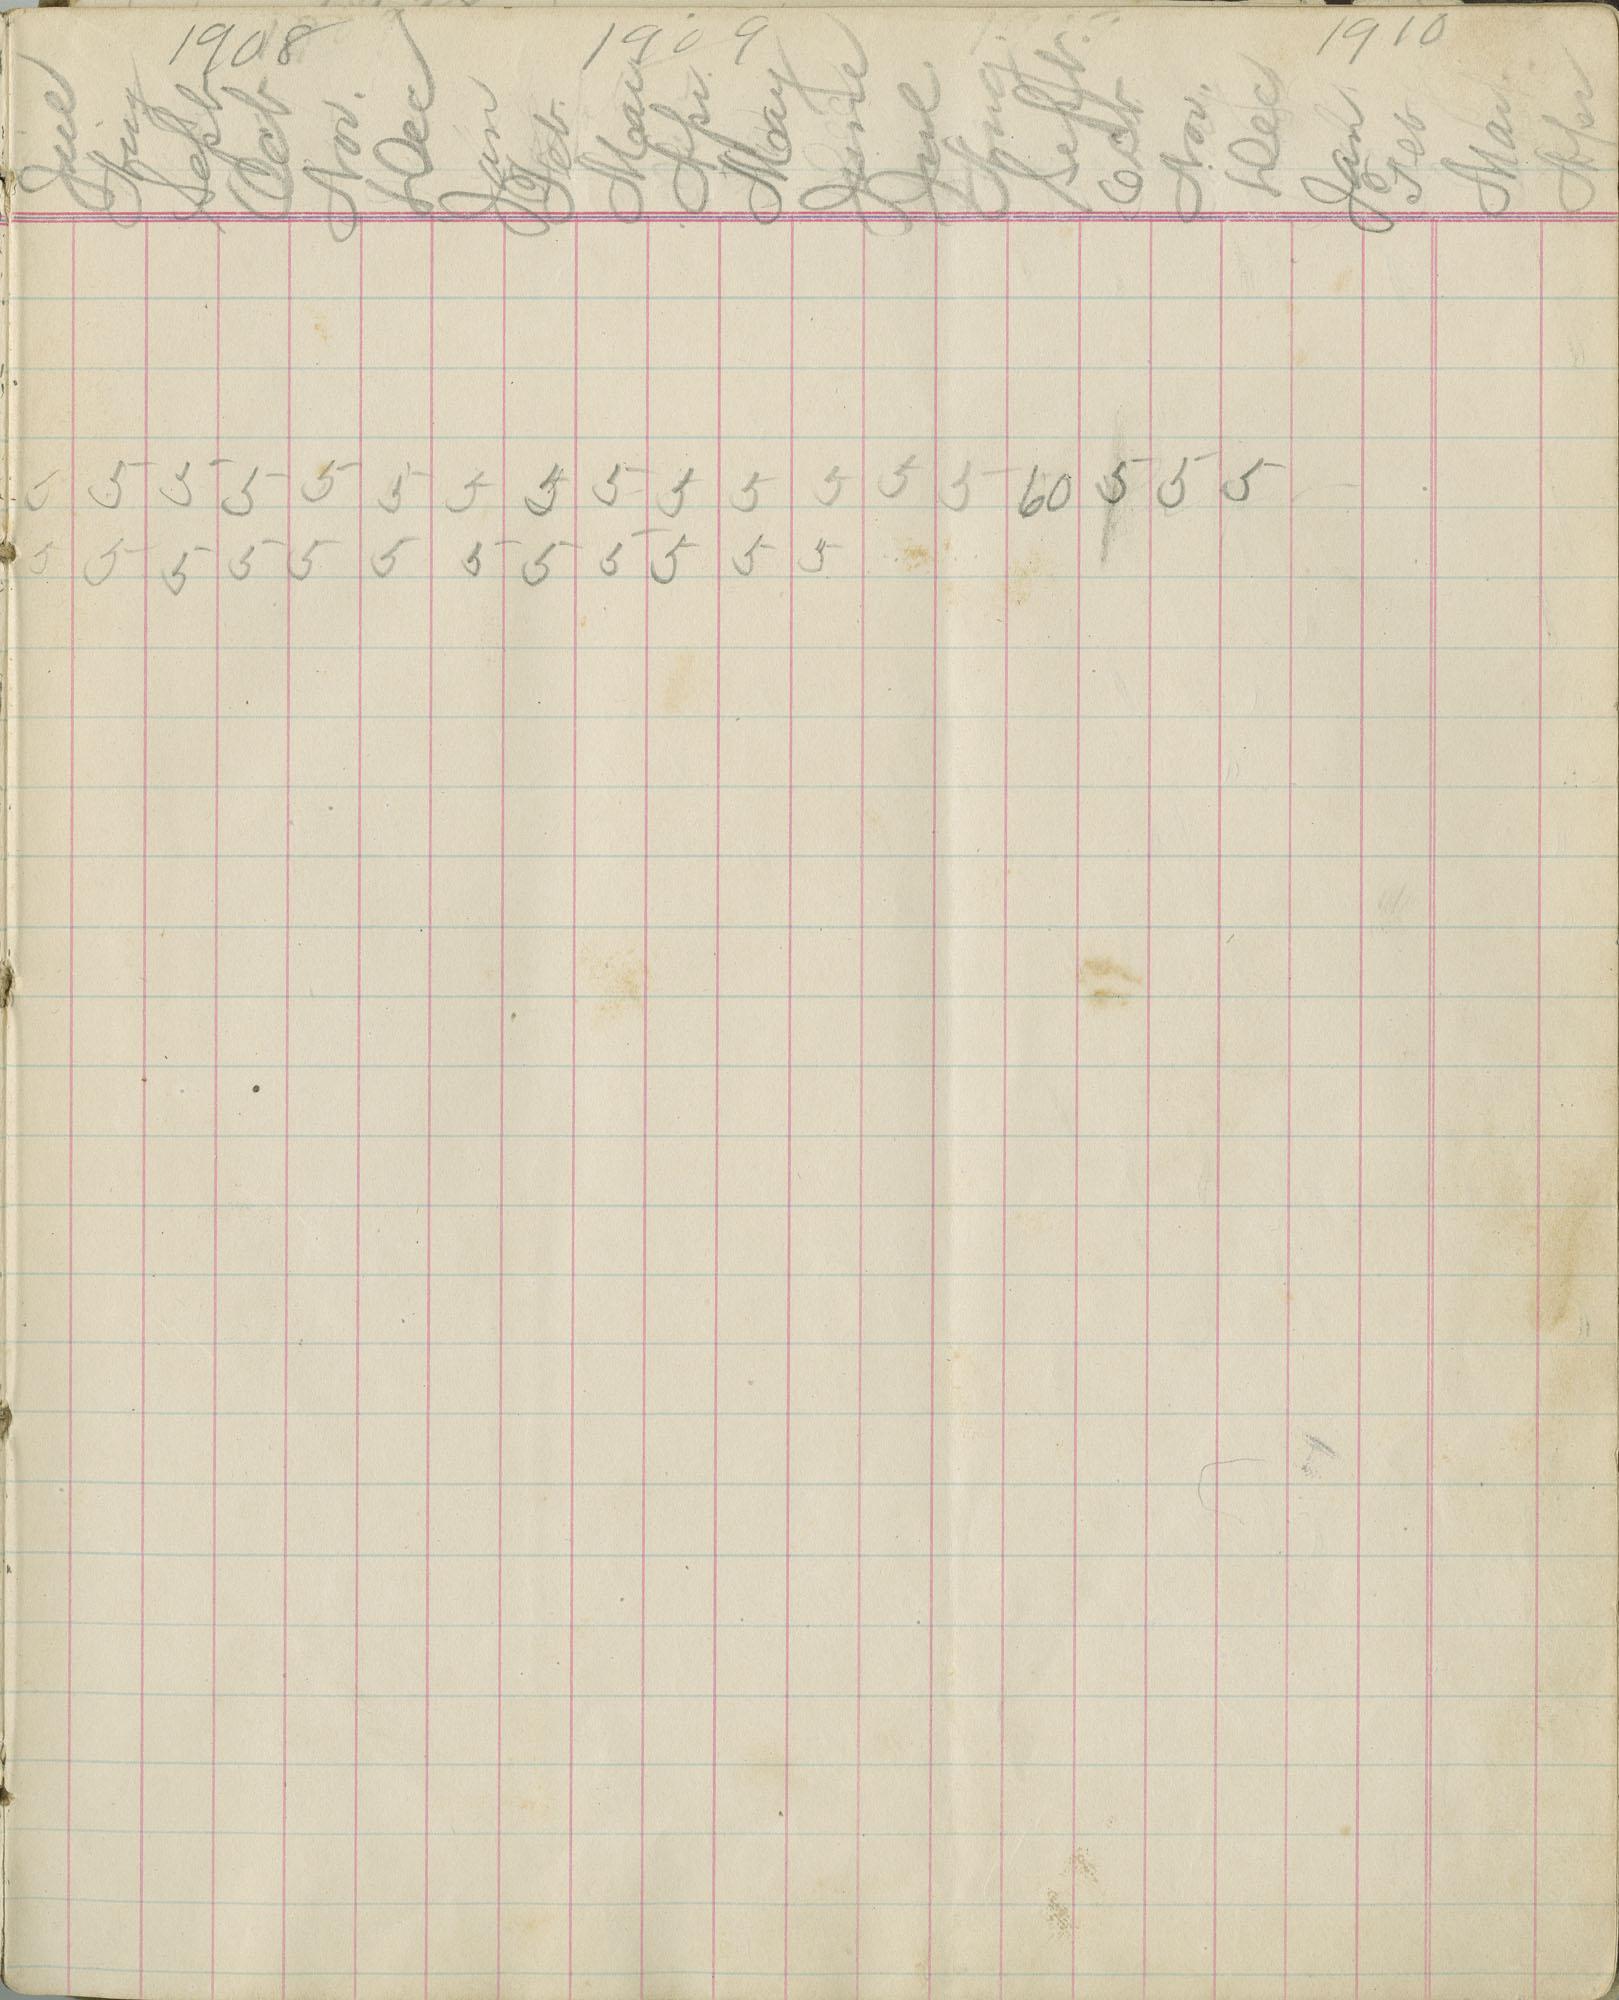 12. Page Ten, Arrear Book, July 1908- April 1910